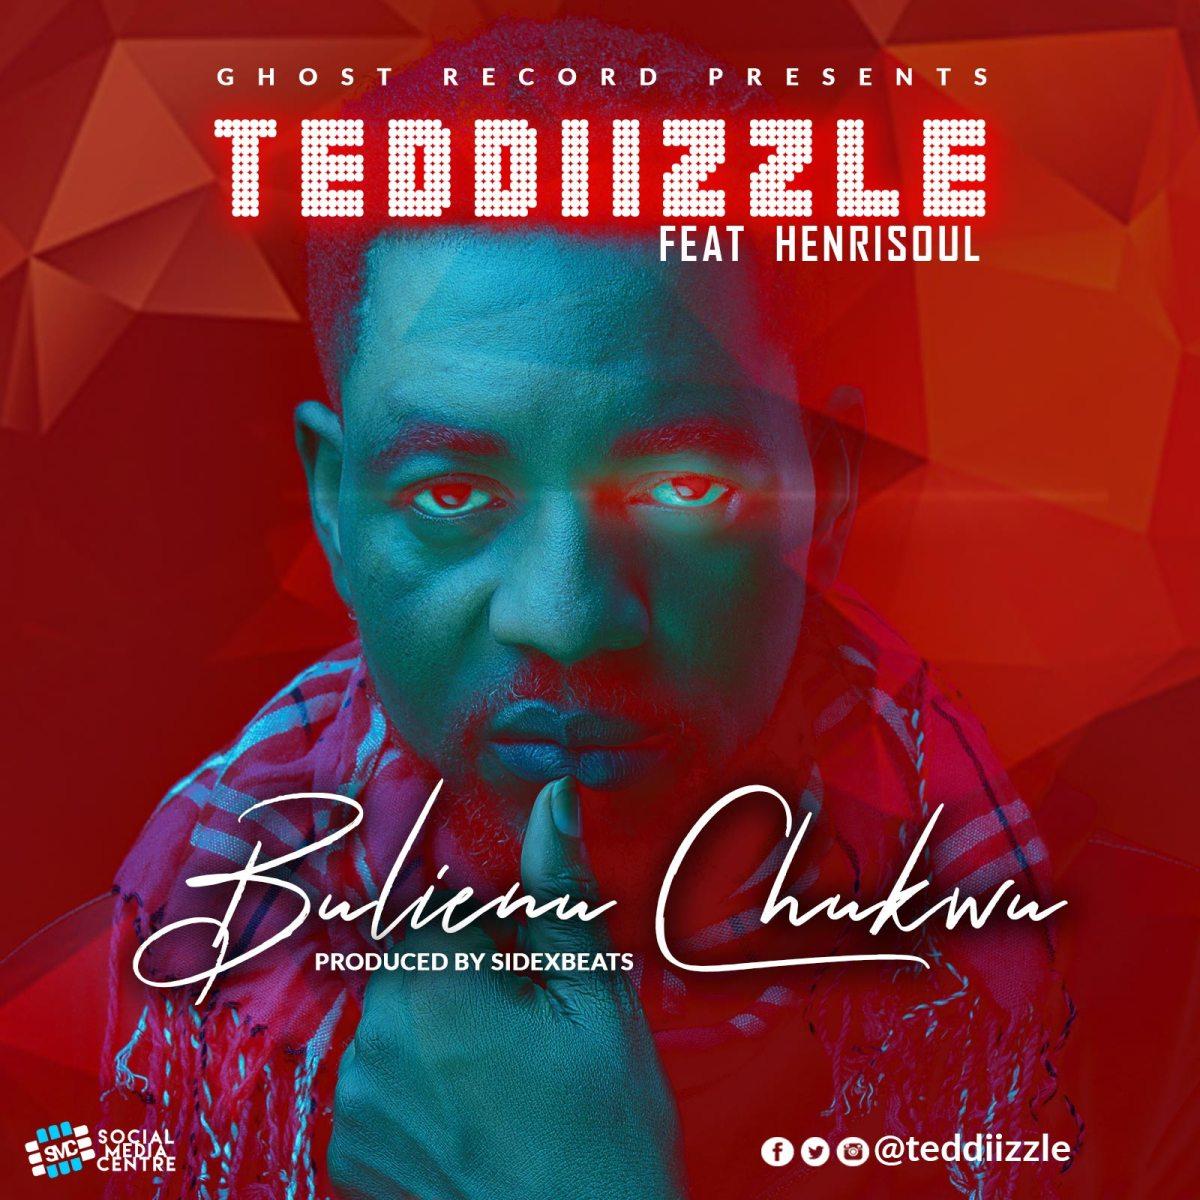 #SelahMusic: Teddizzle | Bulienu Chukwu | Feat. Henrisoul [@teddiizzle]